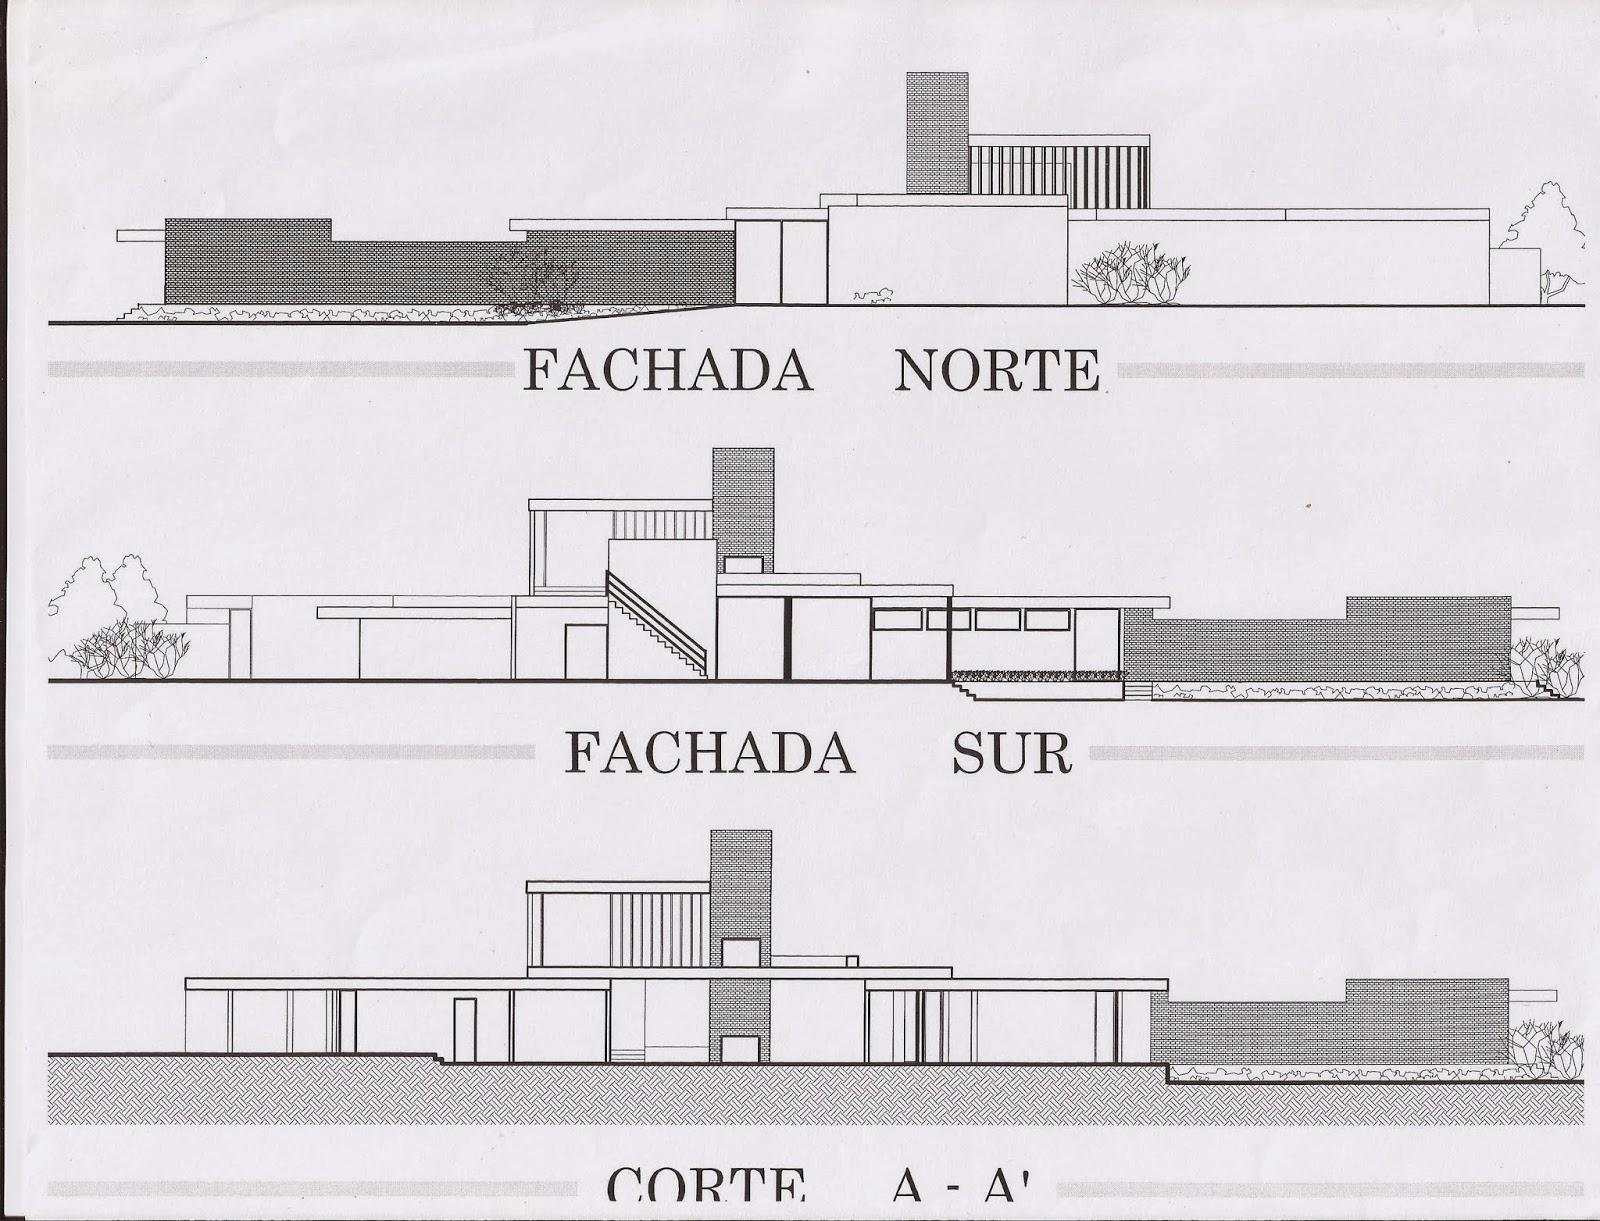 Historia de la Arquitectura Moderna Casa del desierto